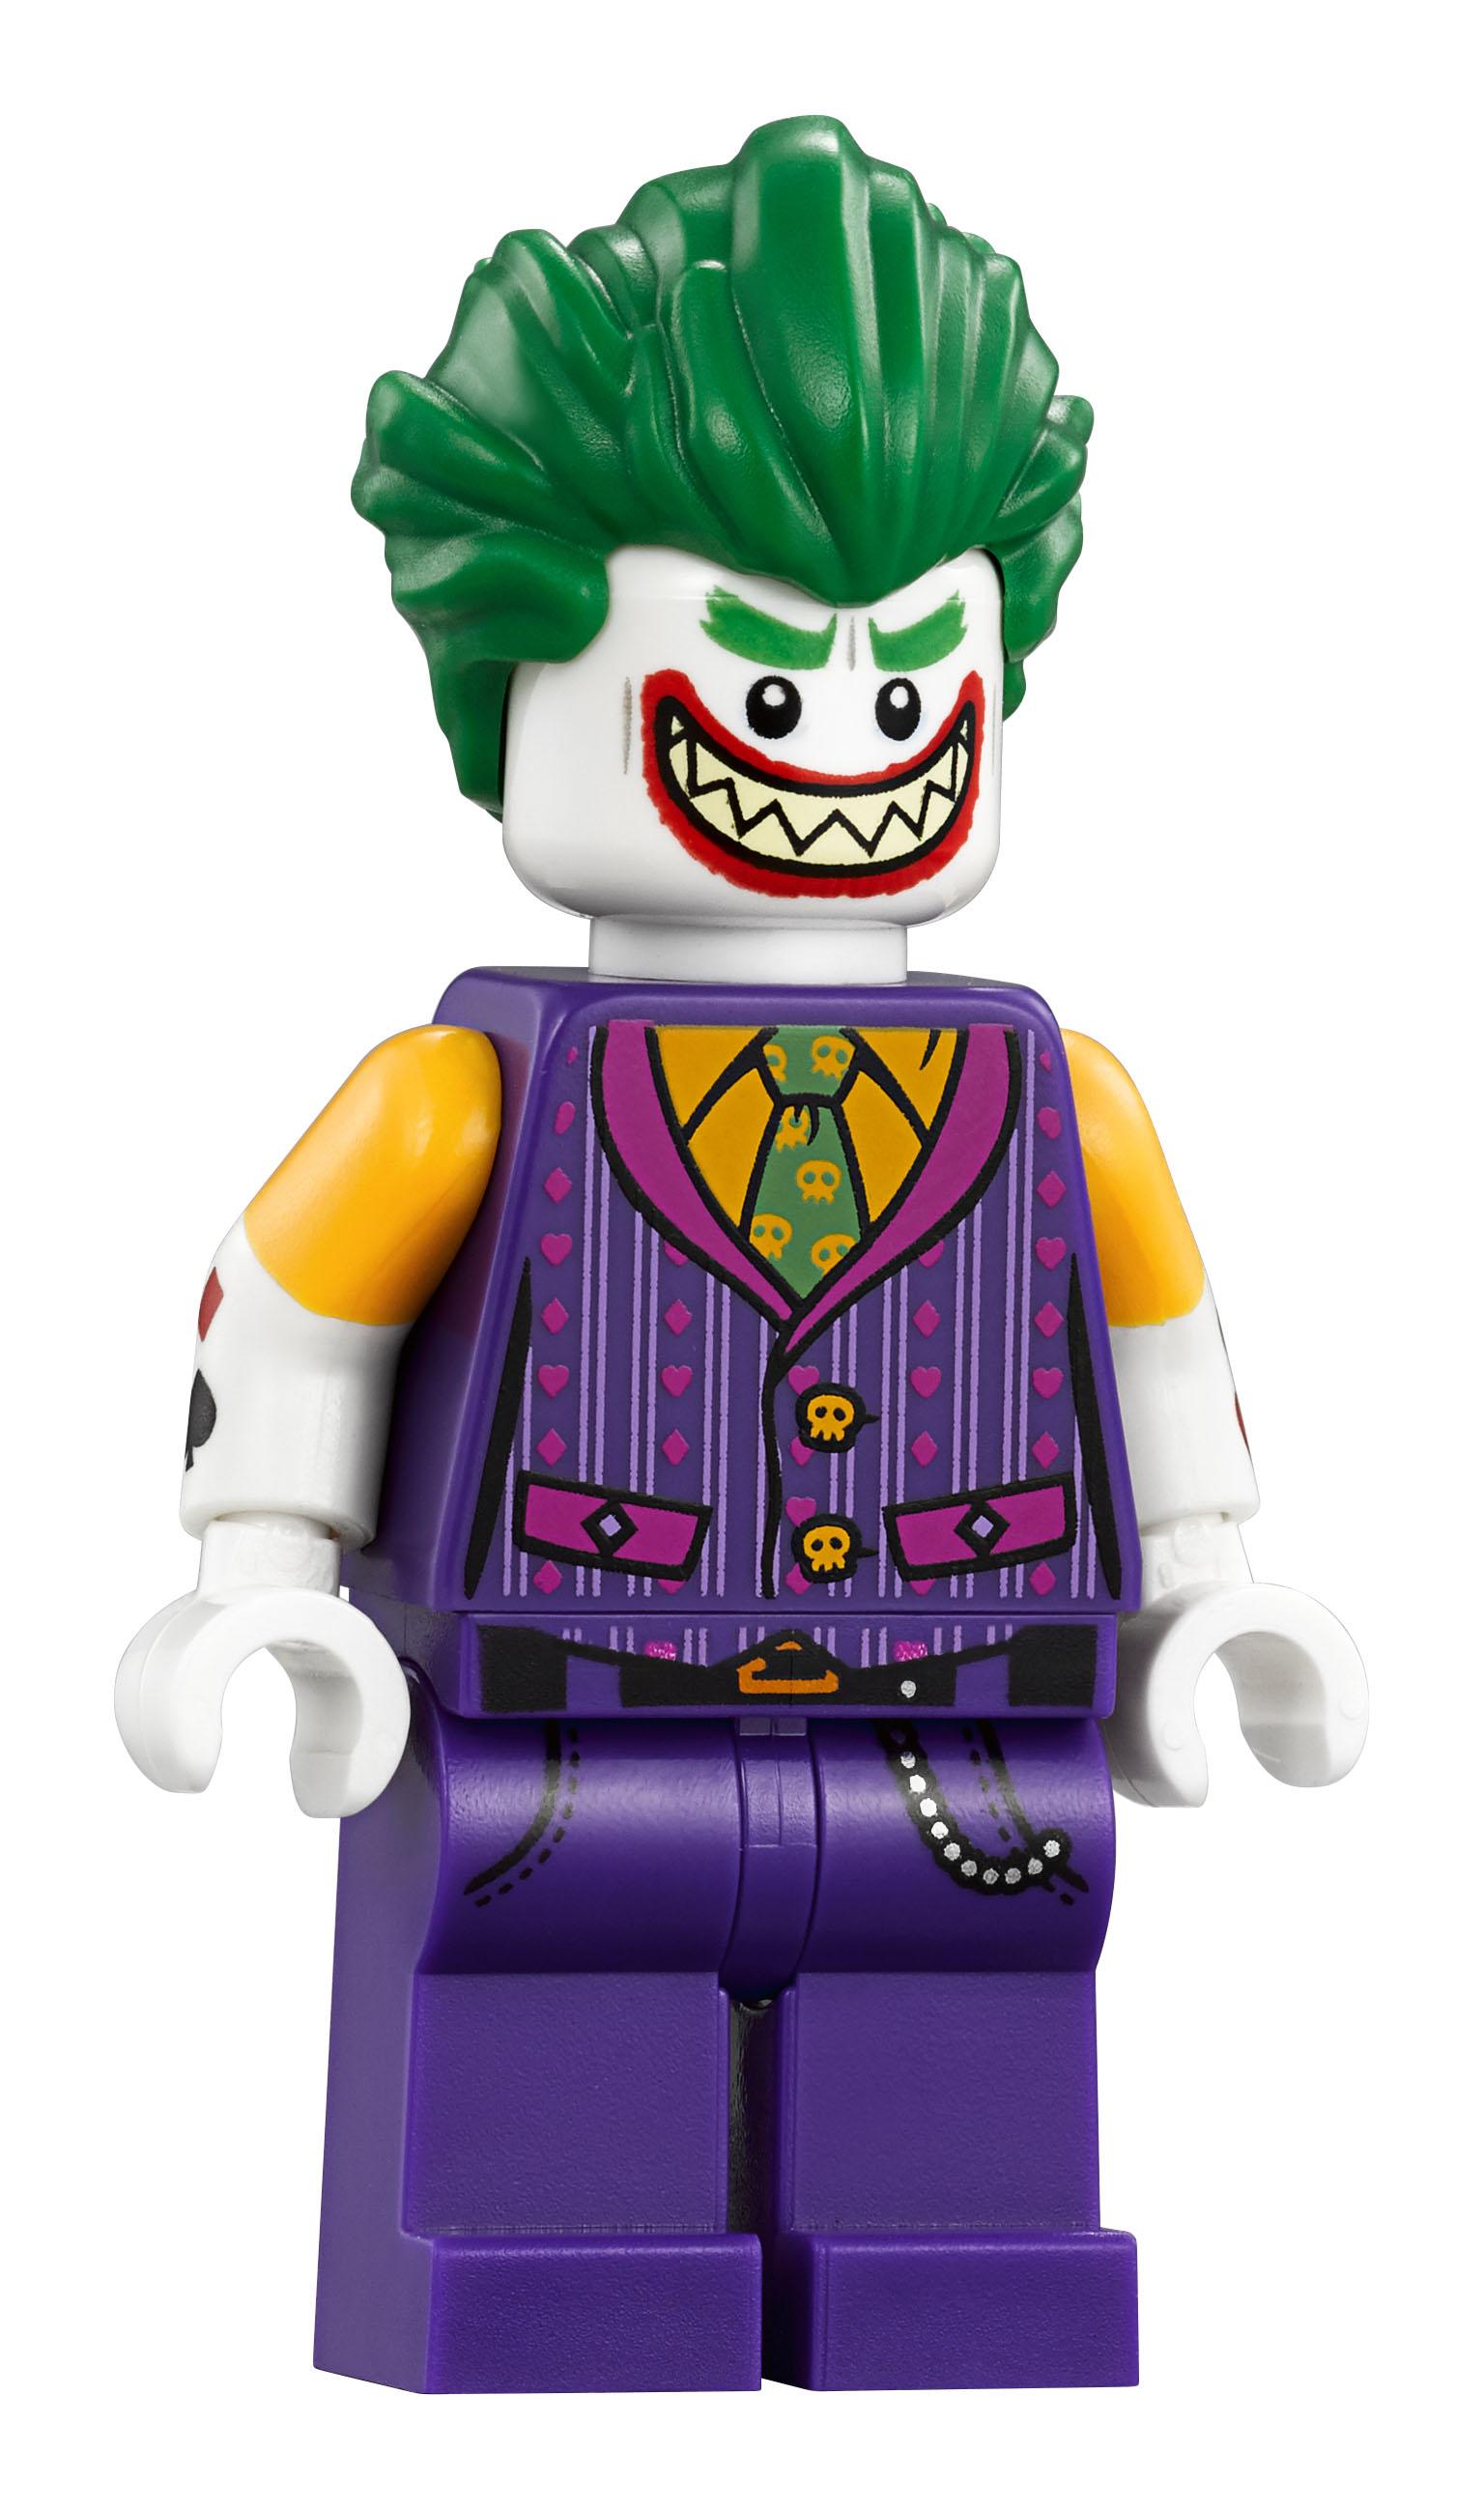 The Lego Batman Movie The Joker Manor 70922 Officially